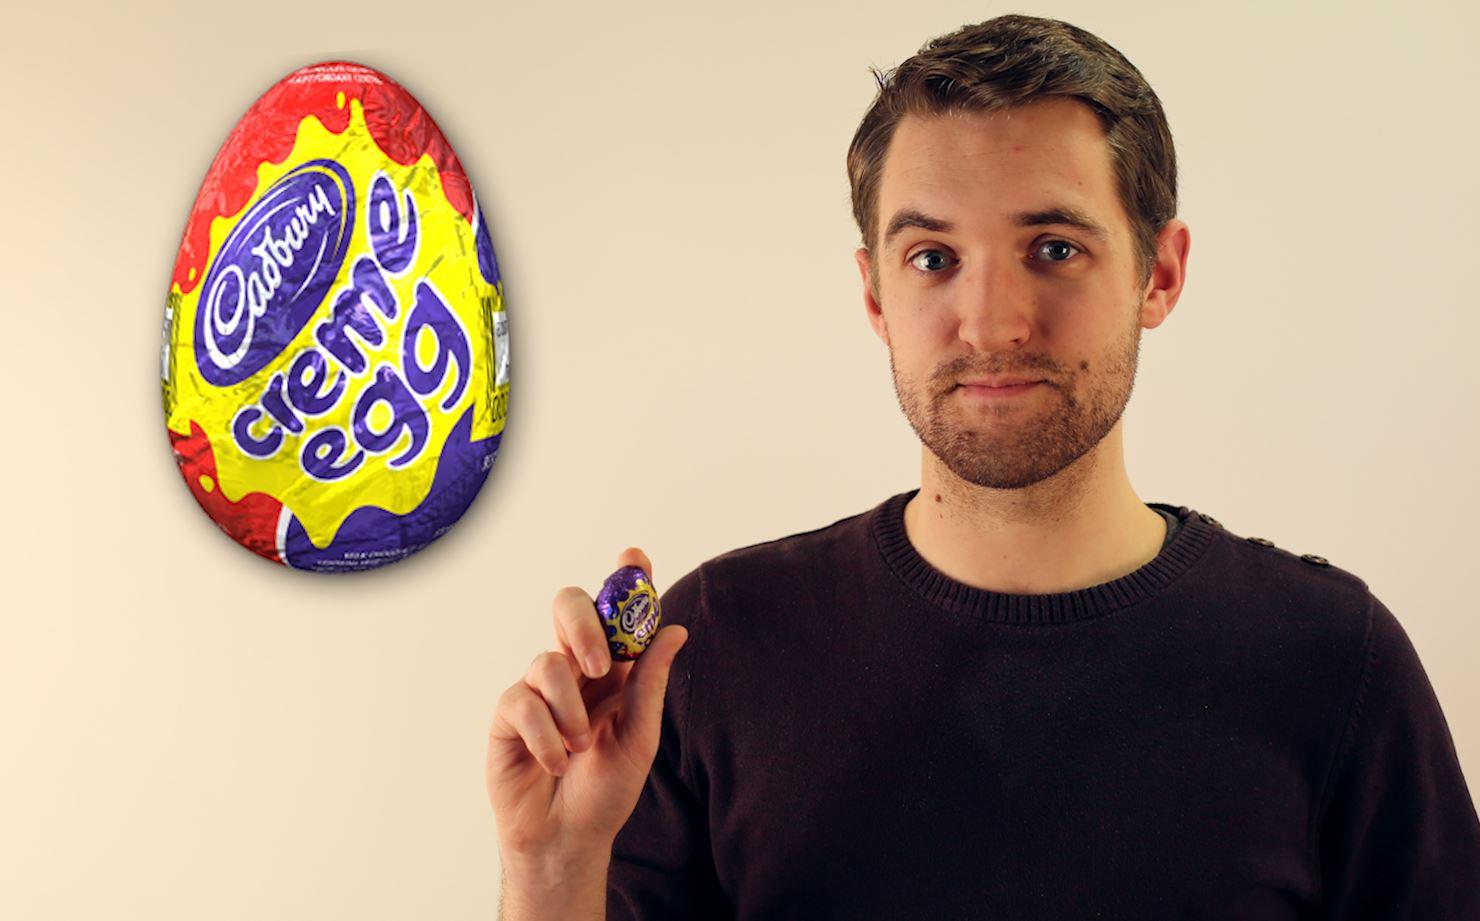 Cadbury Creme Egg taste test: Is the new egg better or worse?